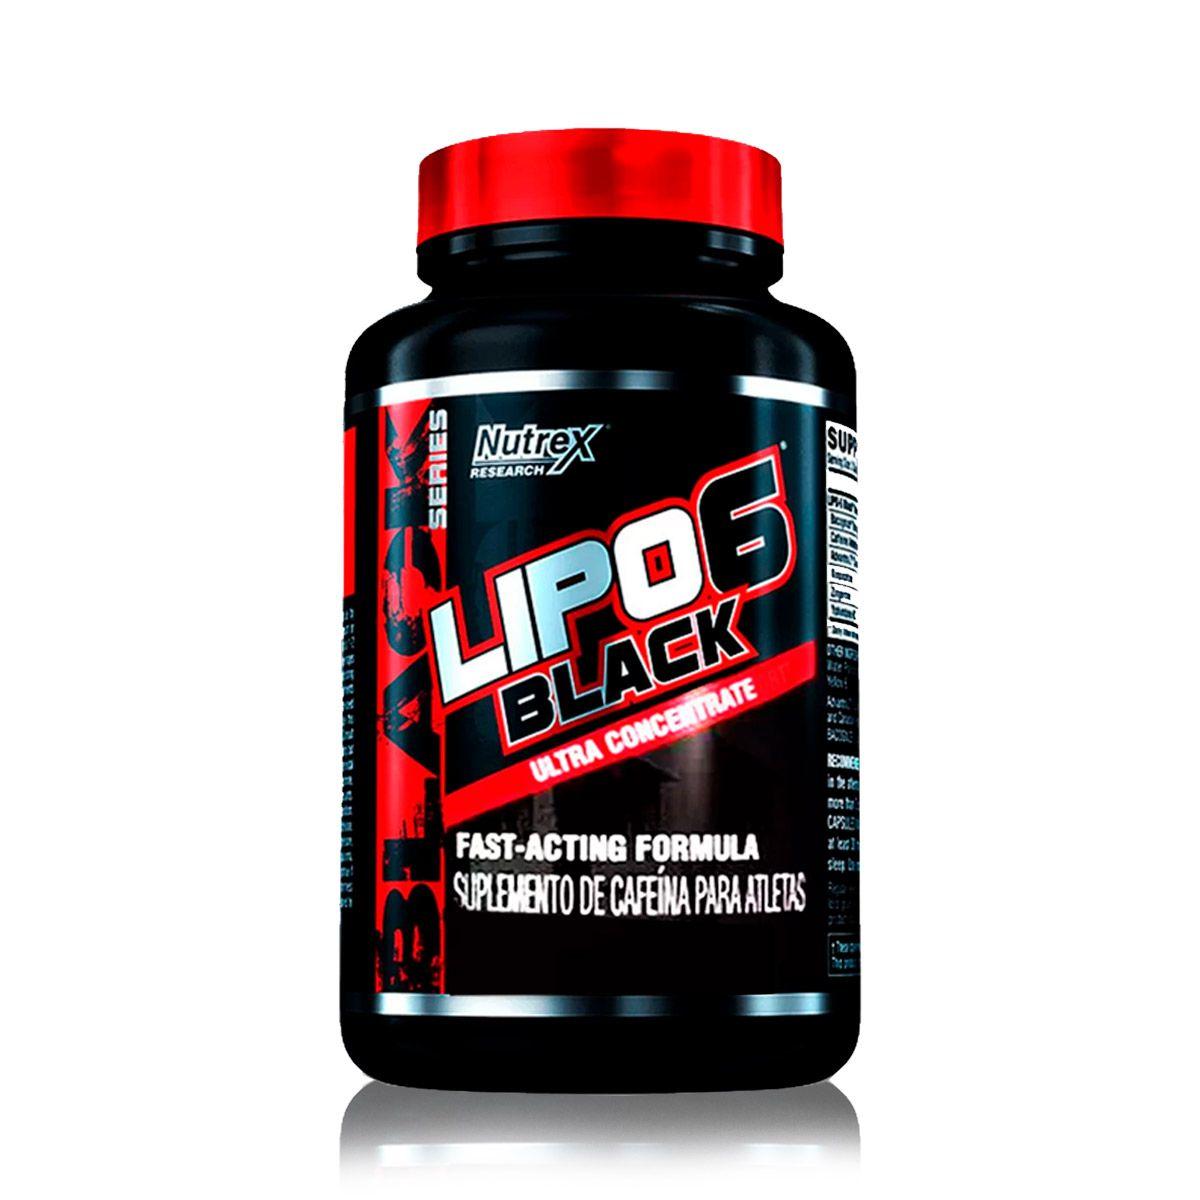 Lipo 6 Black 60 Capsulas - Nutrex